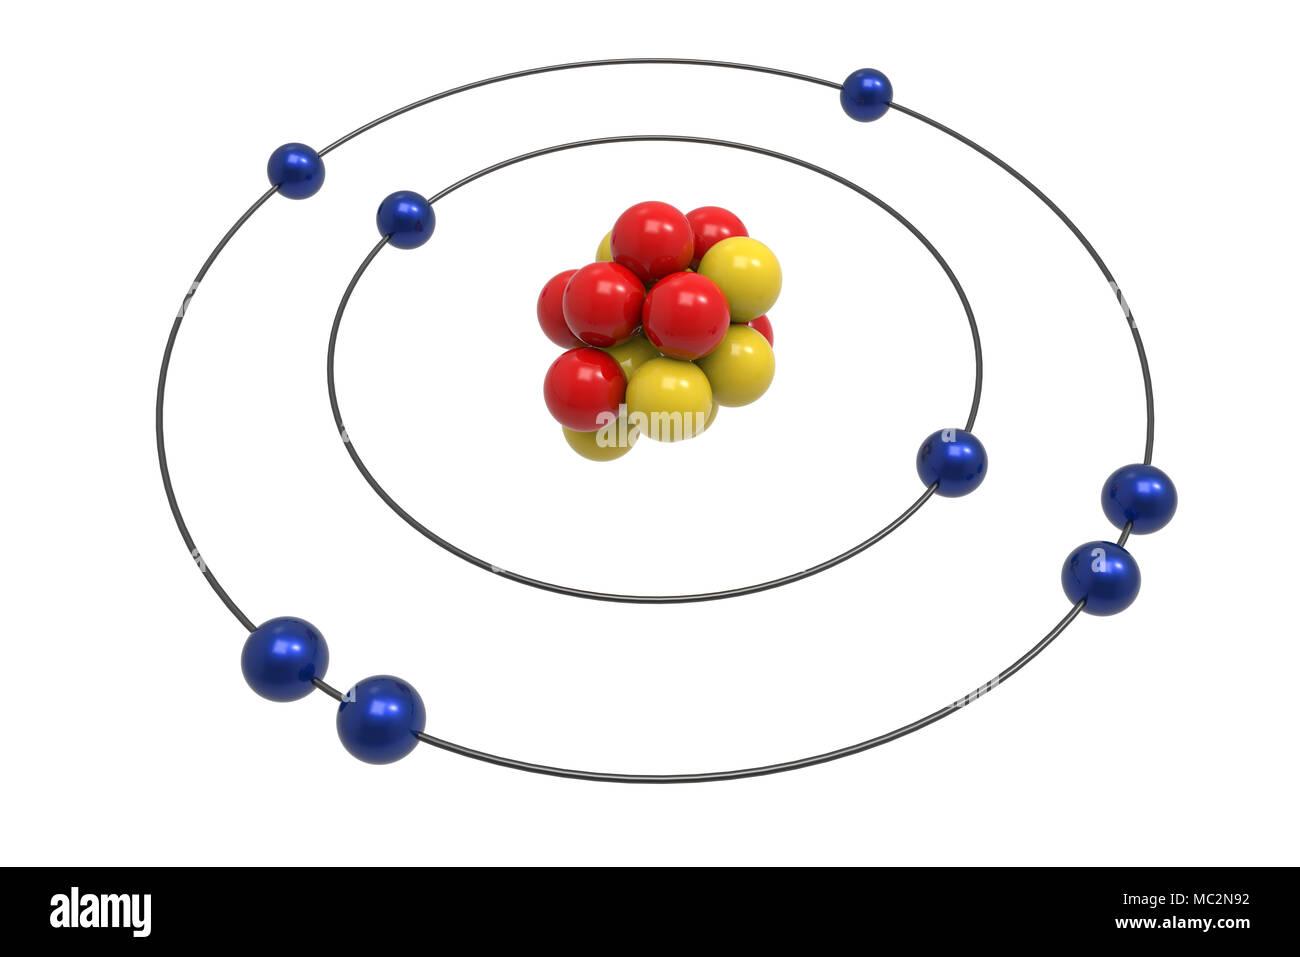 Bohr Model Of Oxygen Atom With Proton  Neutron And